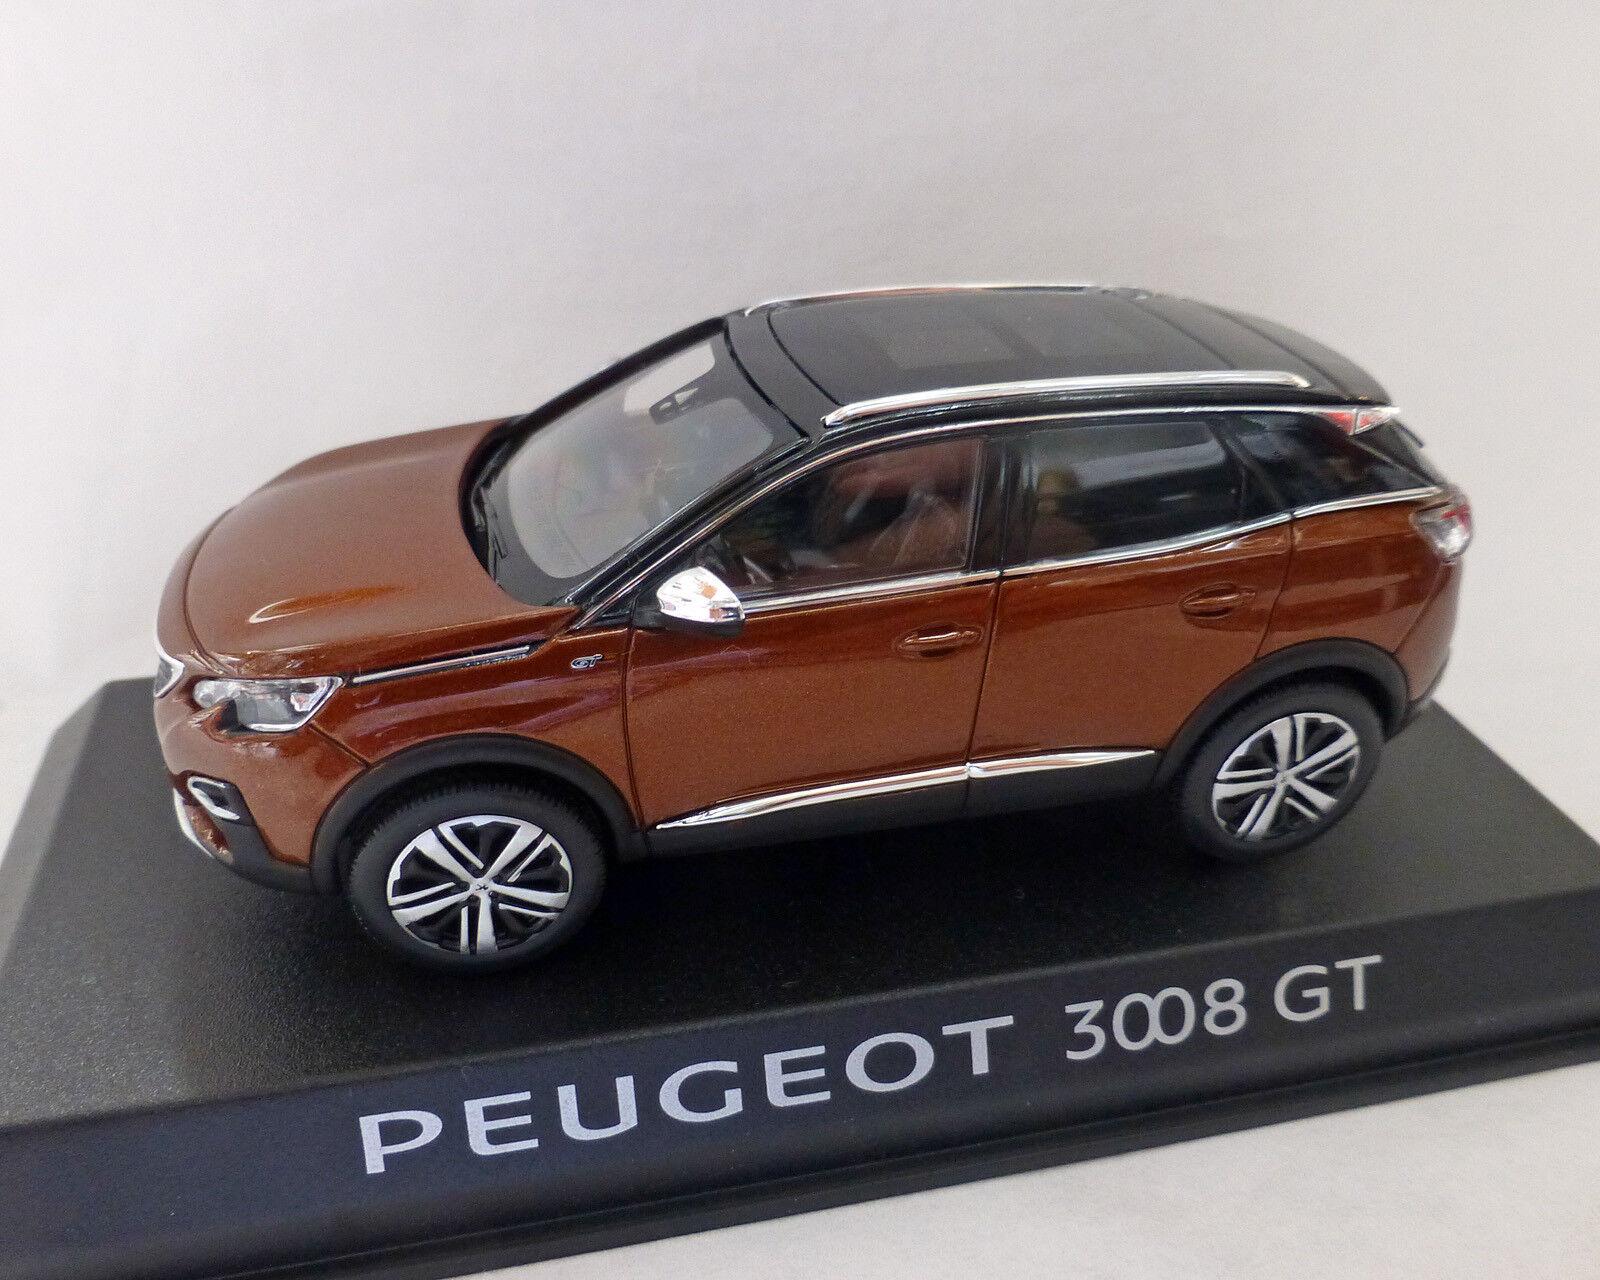 Peugeot 3008 Gt 2016, Kupfer-Metallic, 1 43